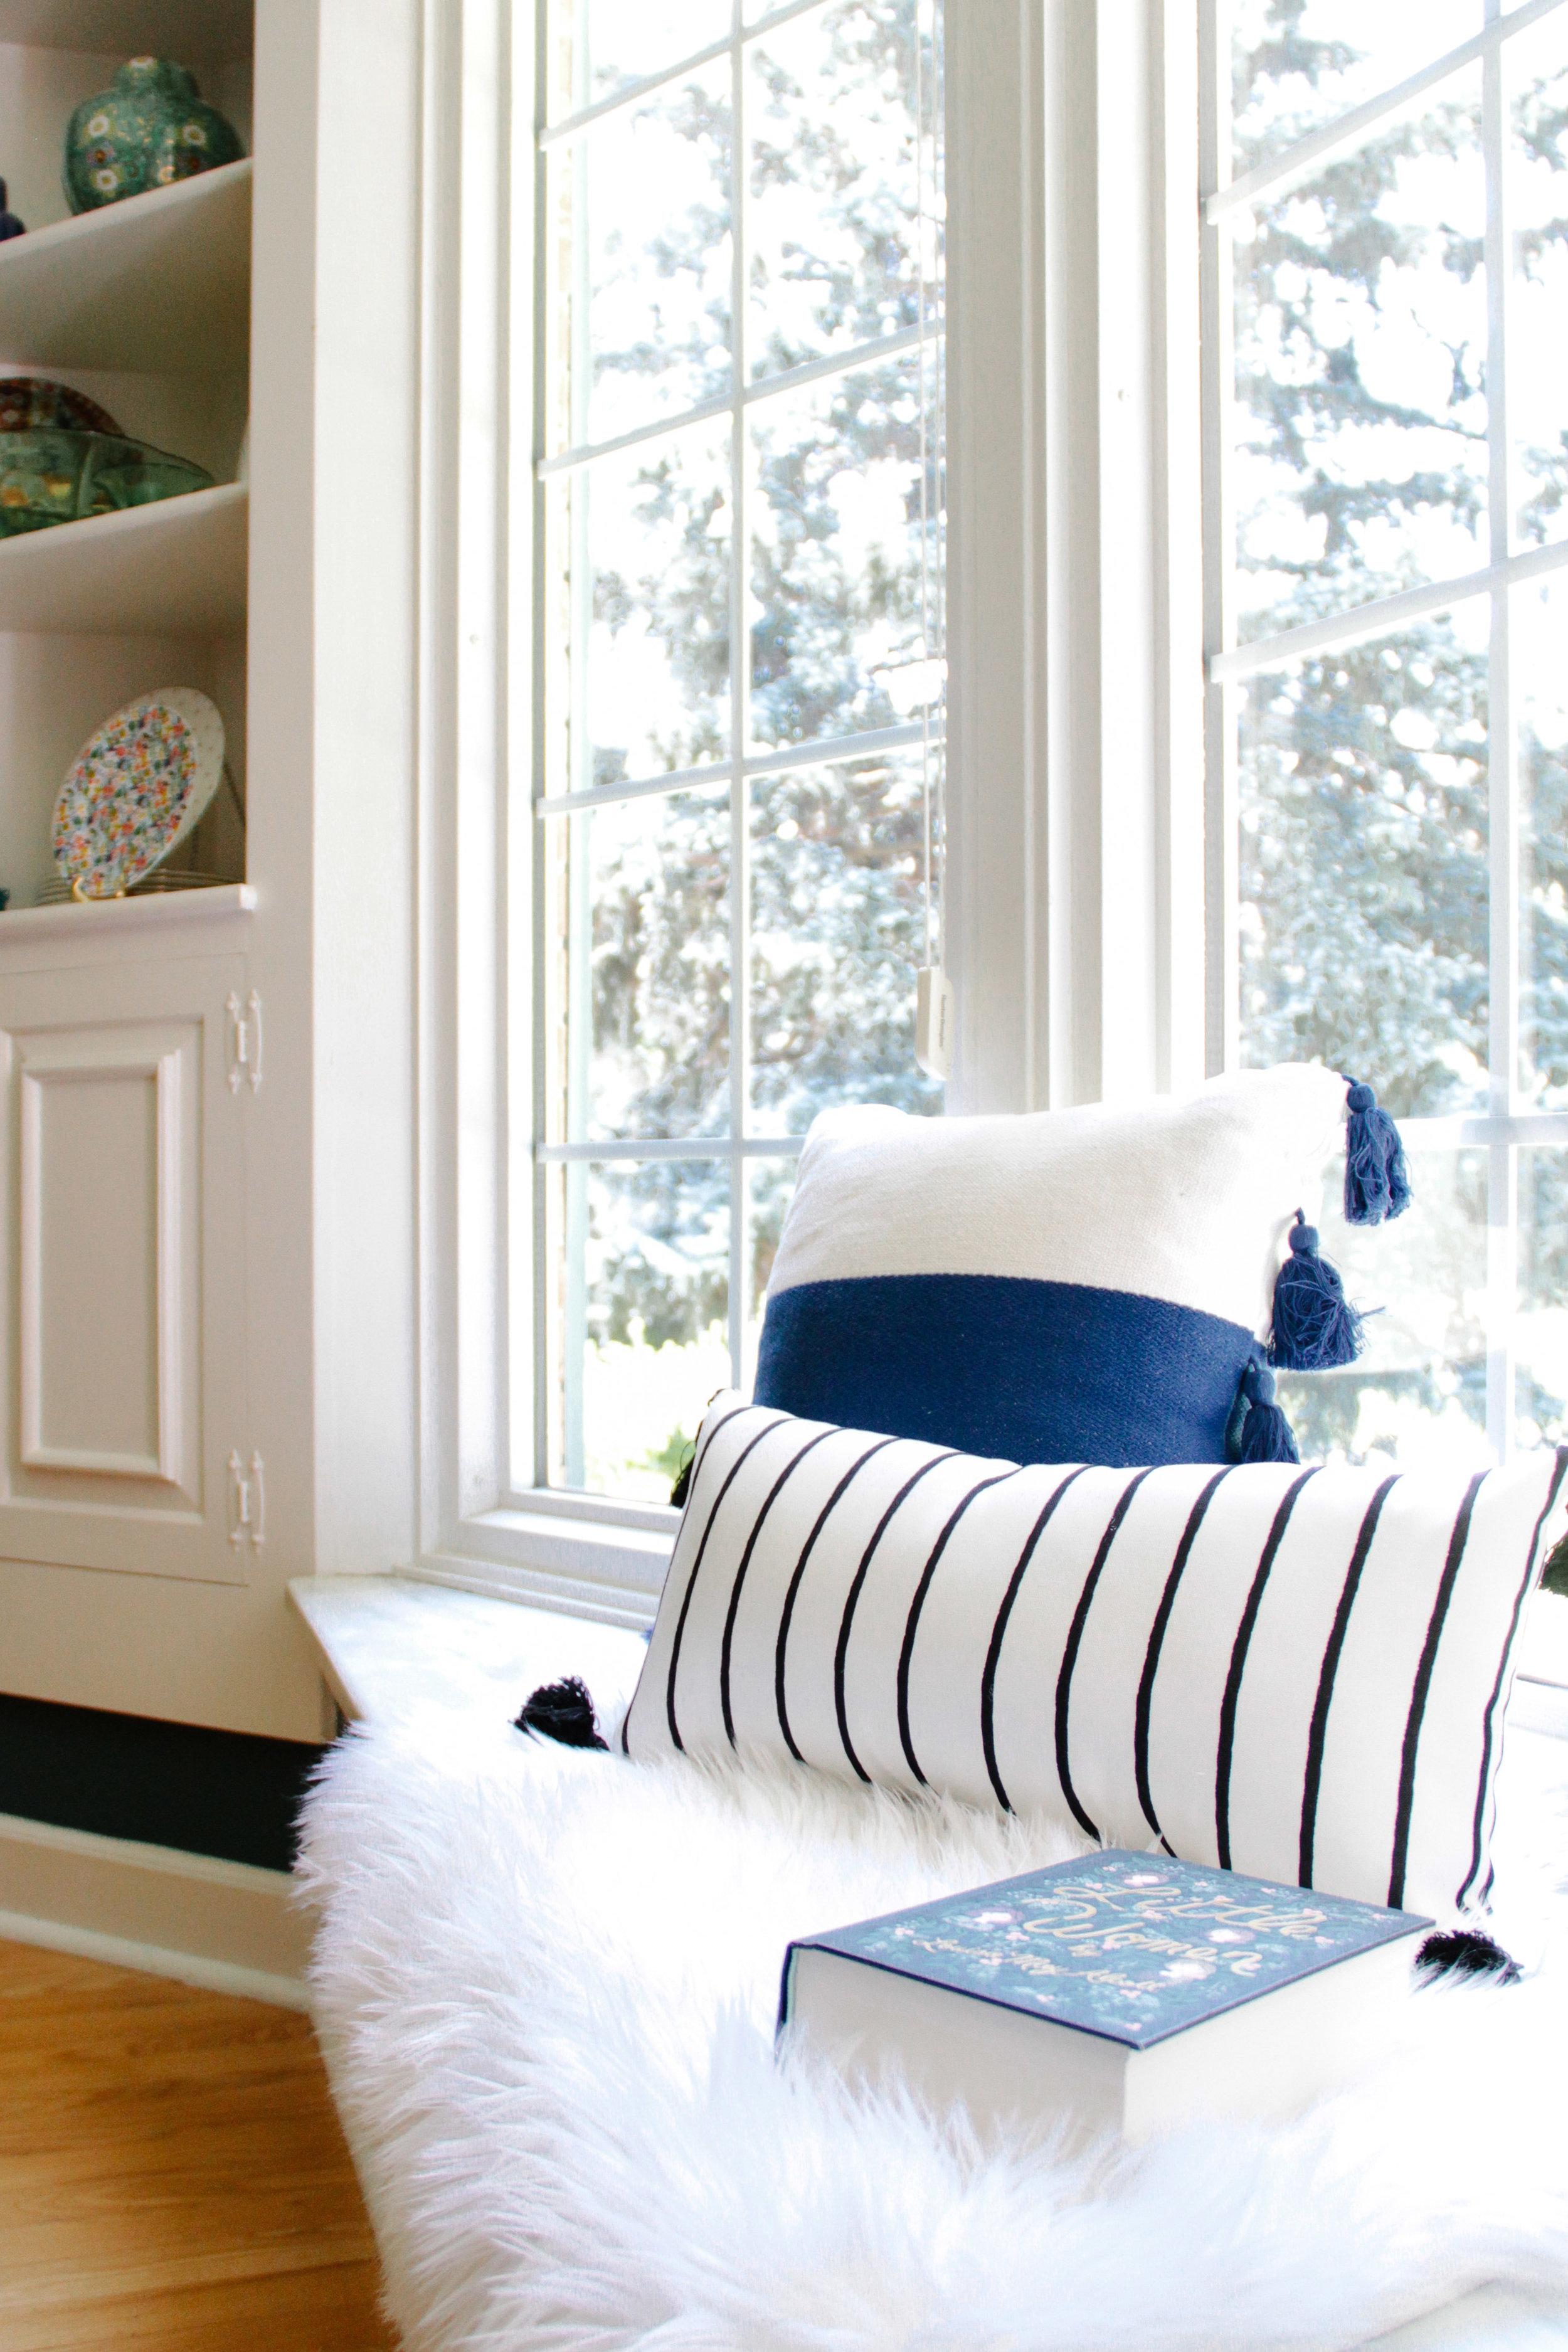 Cozy Window Seat Between Corner Built-Ins in Modern Colonial Dining Room